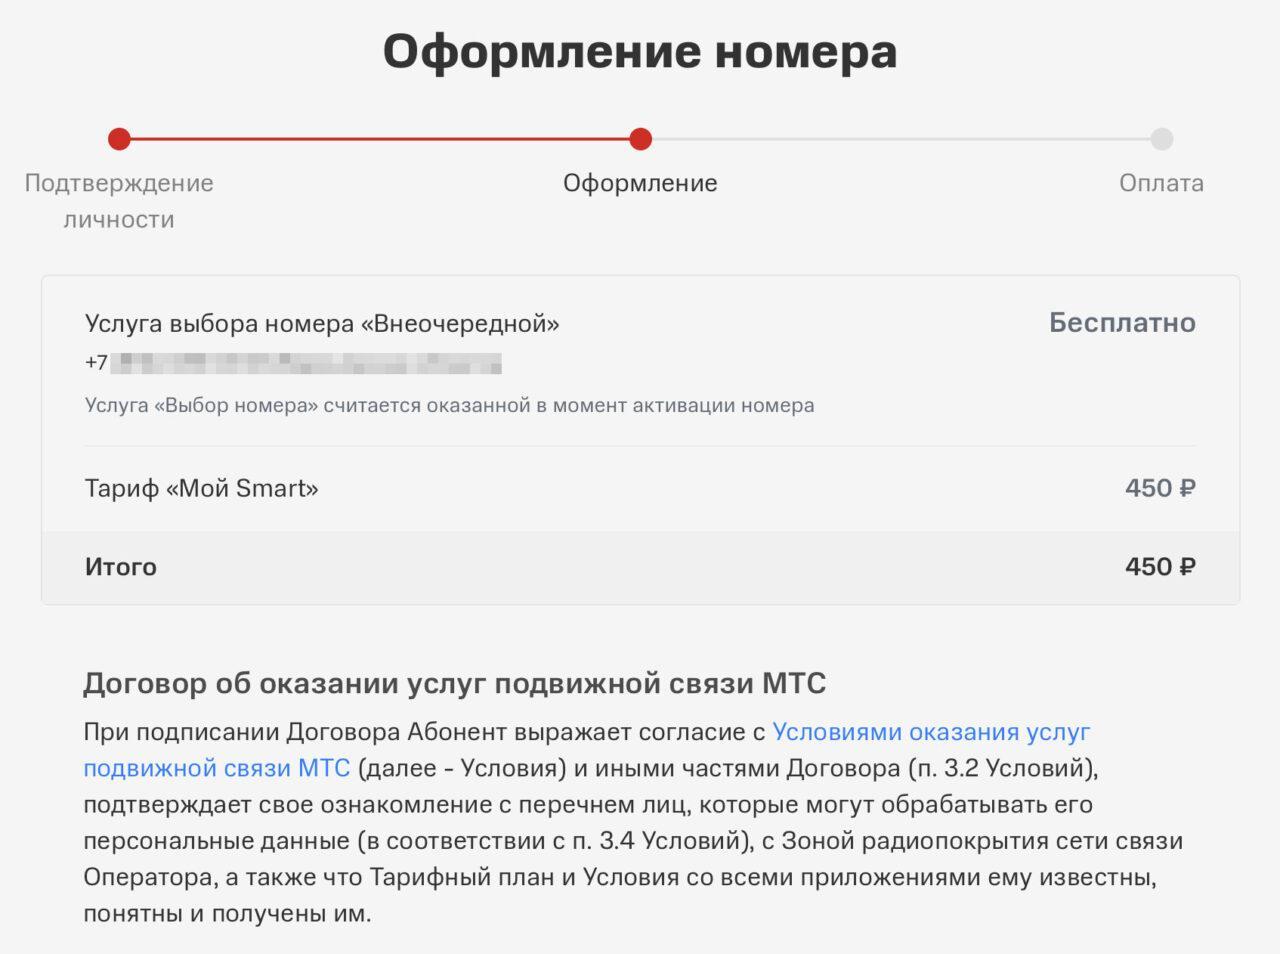 C:\Users\Геральд из Ривии\Desktop\mts-esim-howto-russia-simcard-online-iphonesru-5.jpg